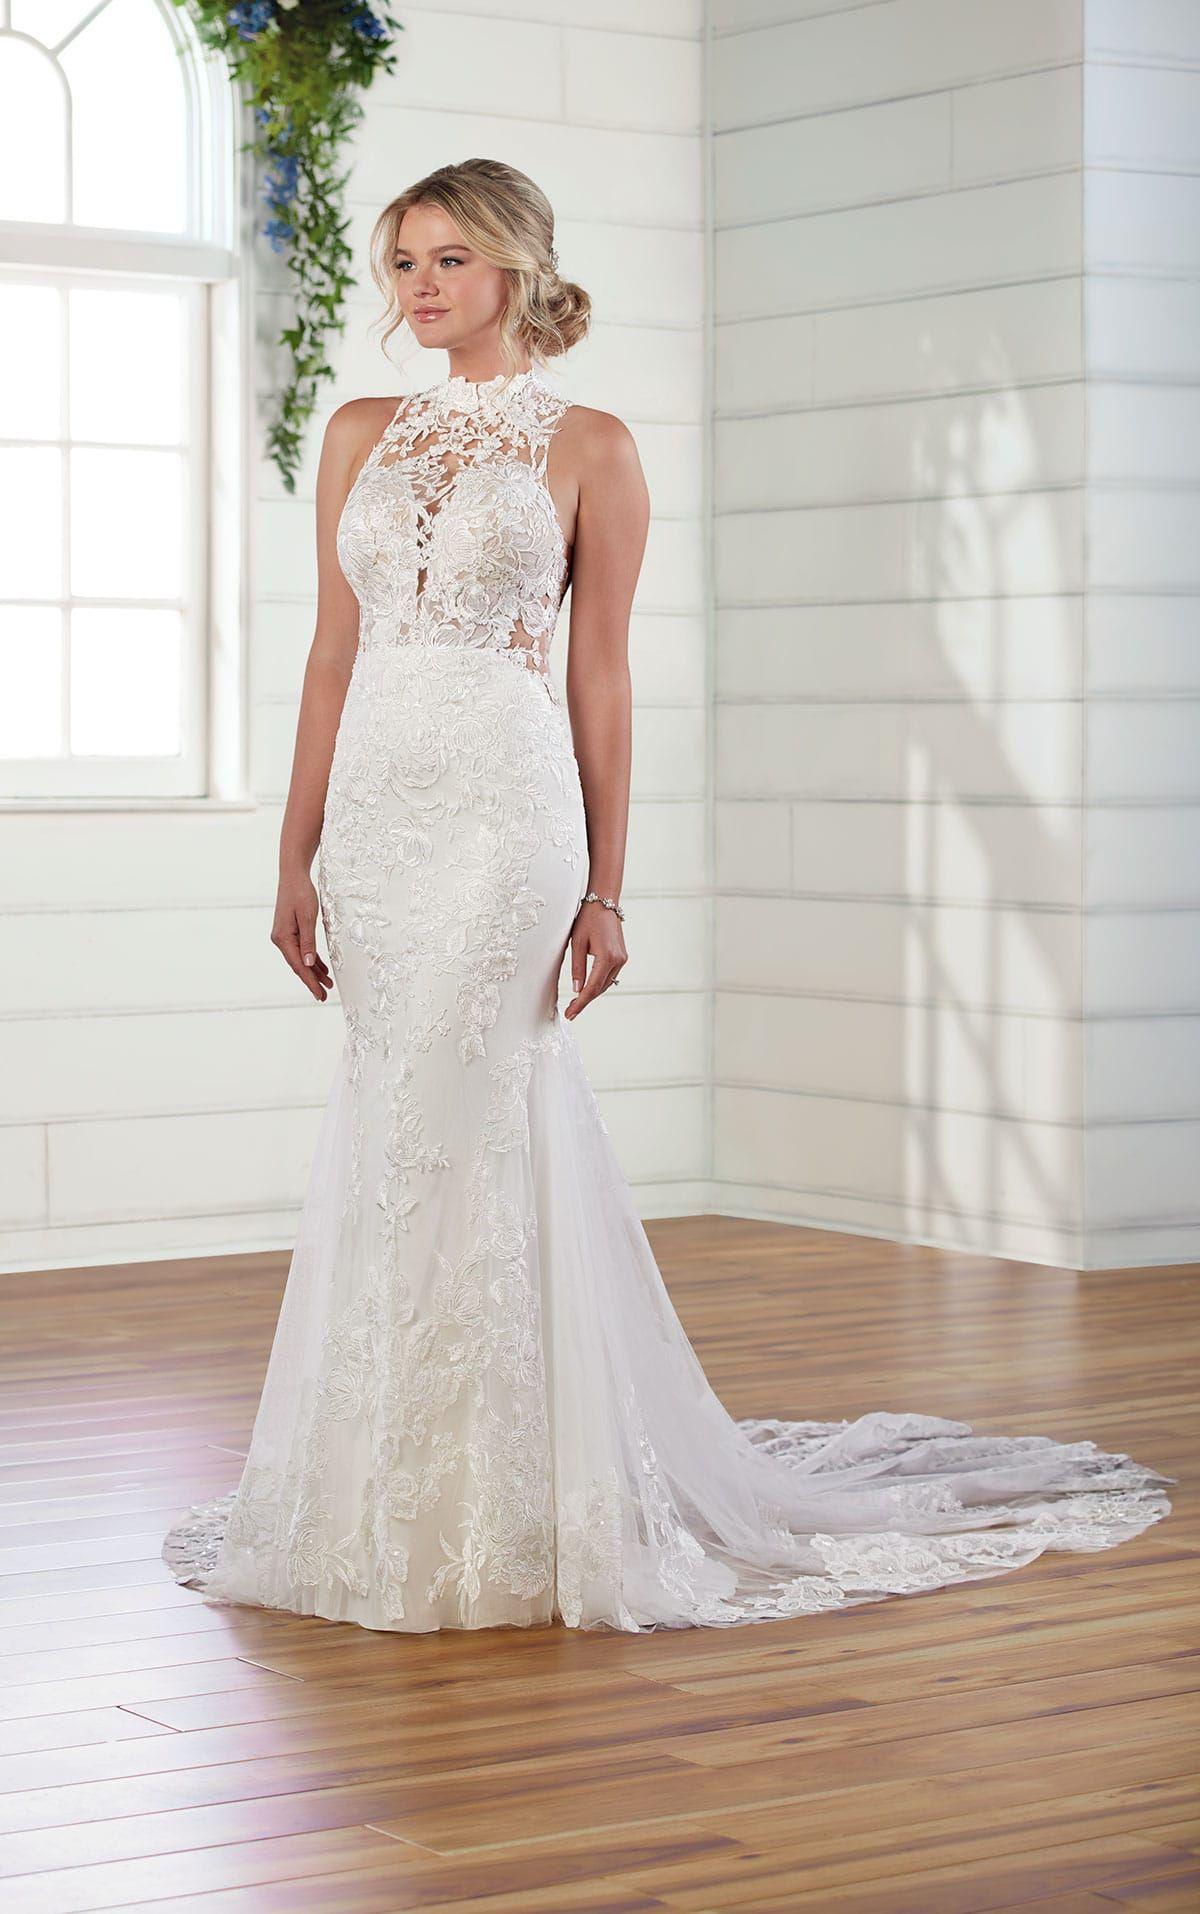 Essense of Australia Dresses Anya Bridal Couture in 2020